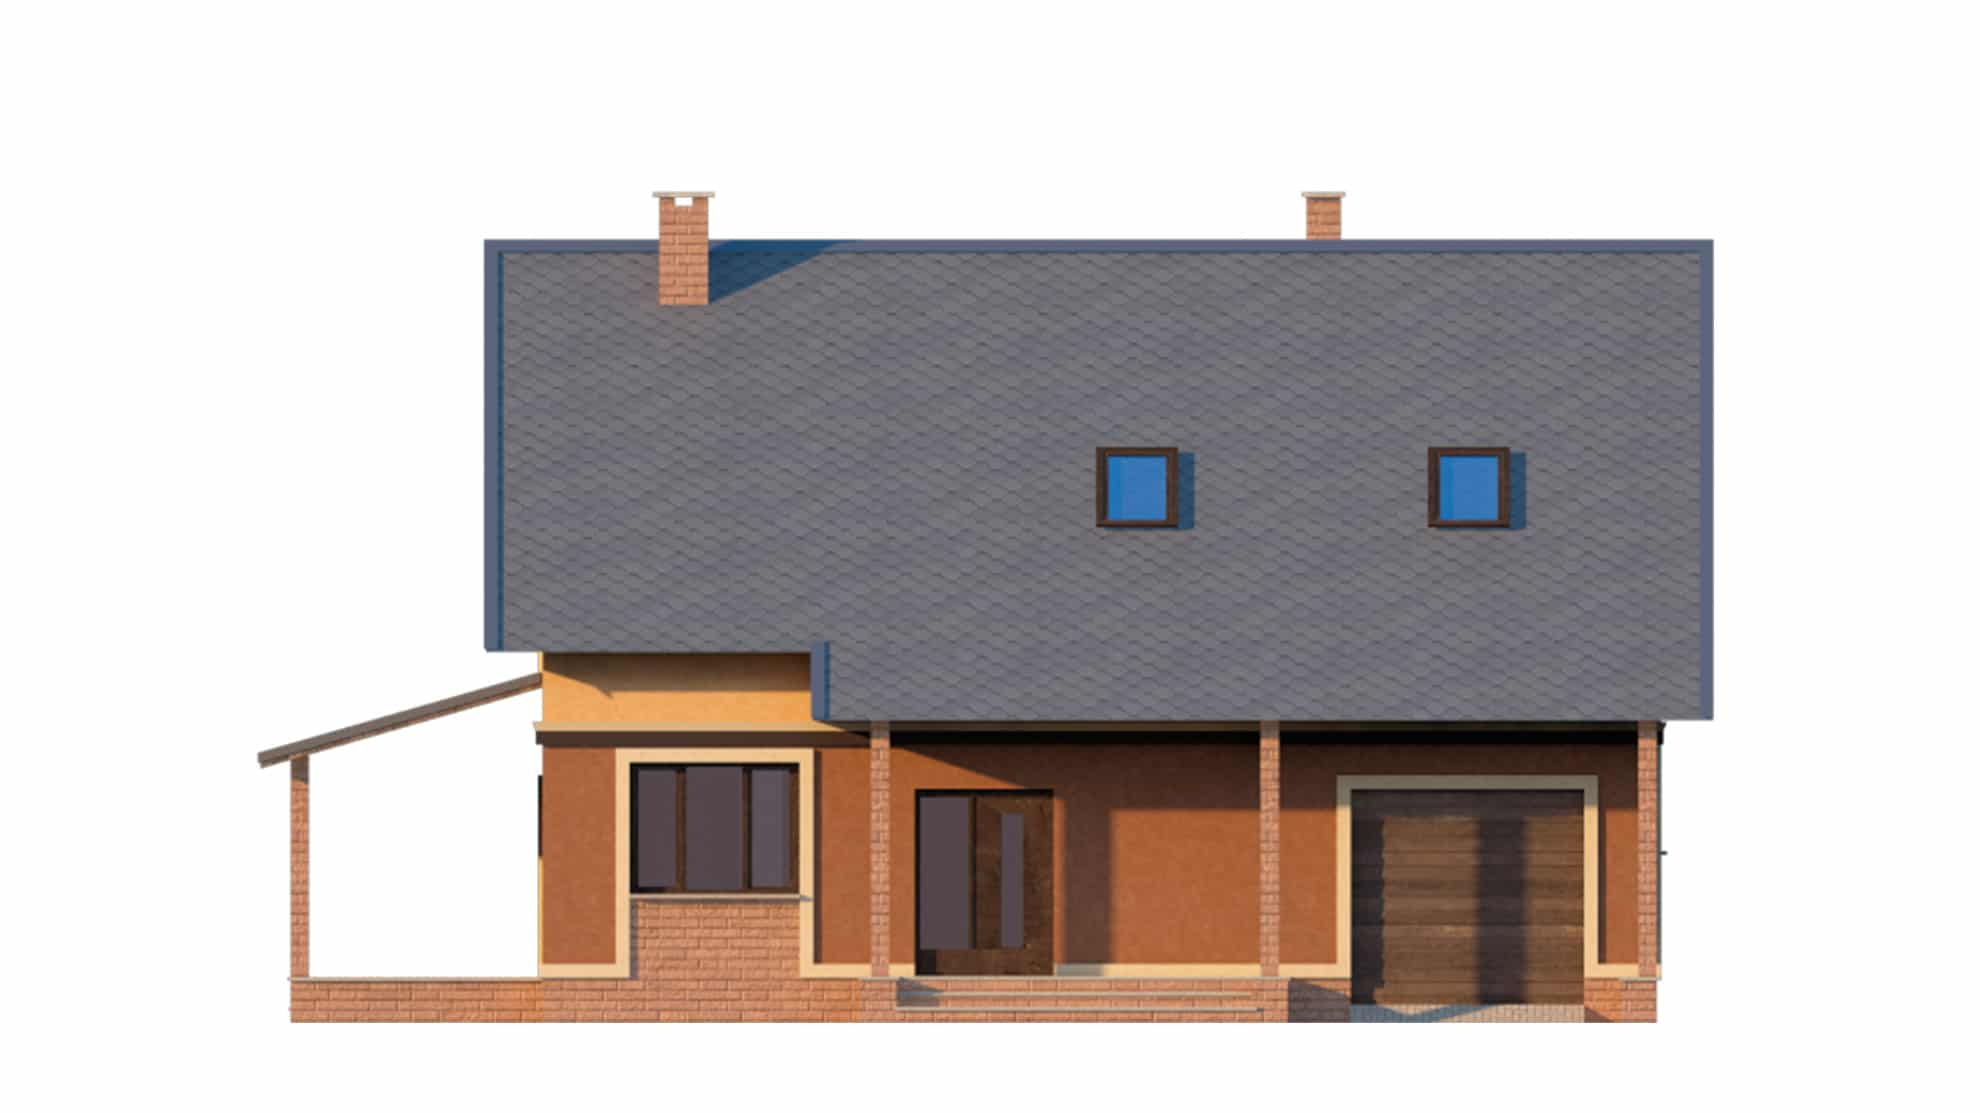 Фасад мансардного дома с гаражом «КМ-18» - спереди